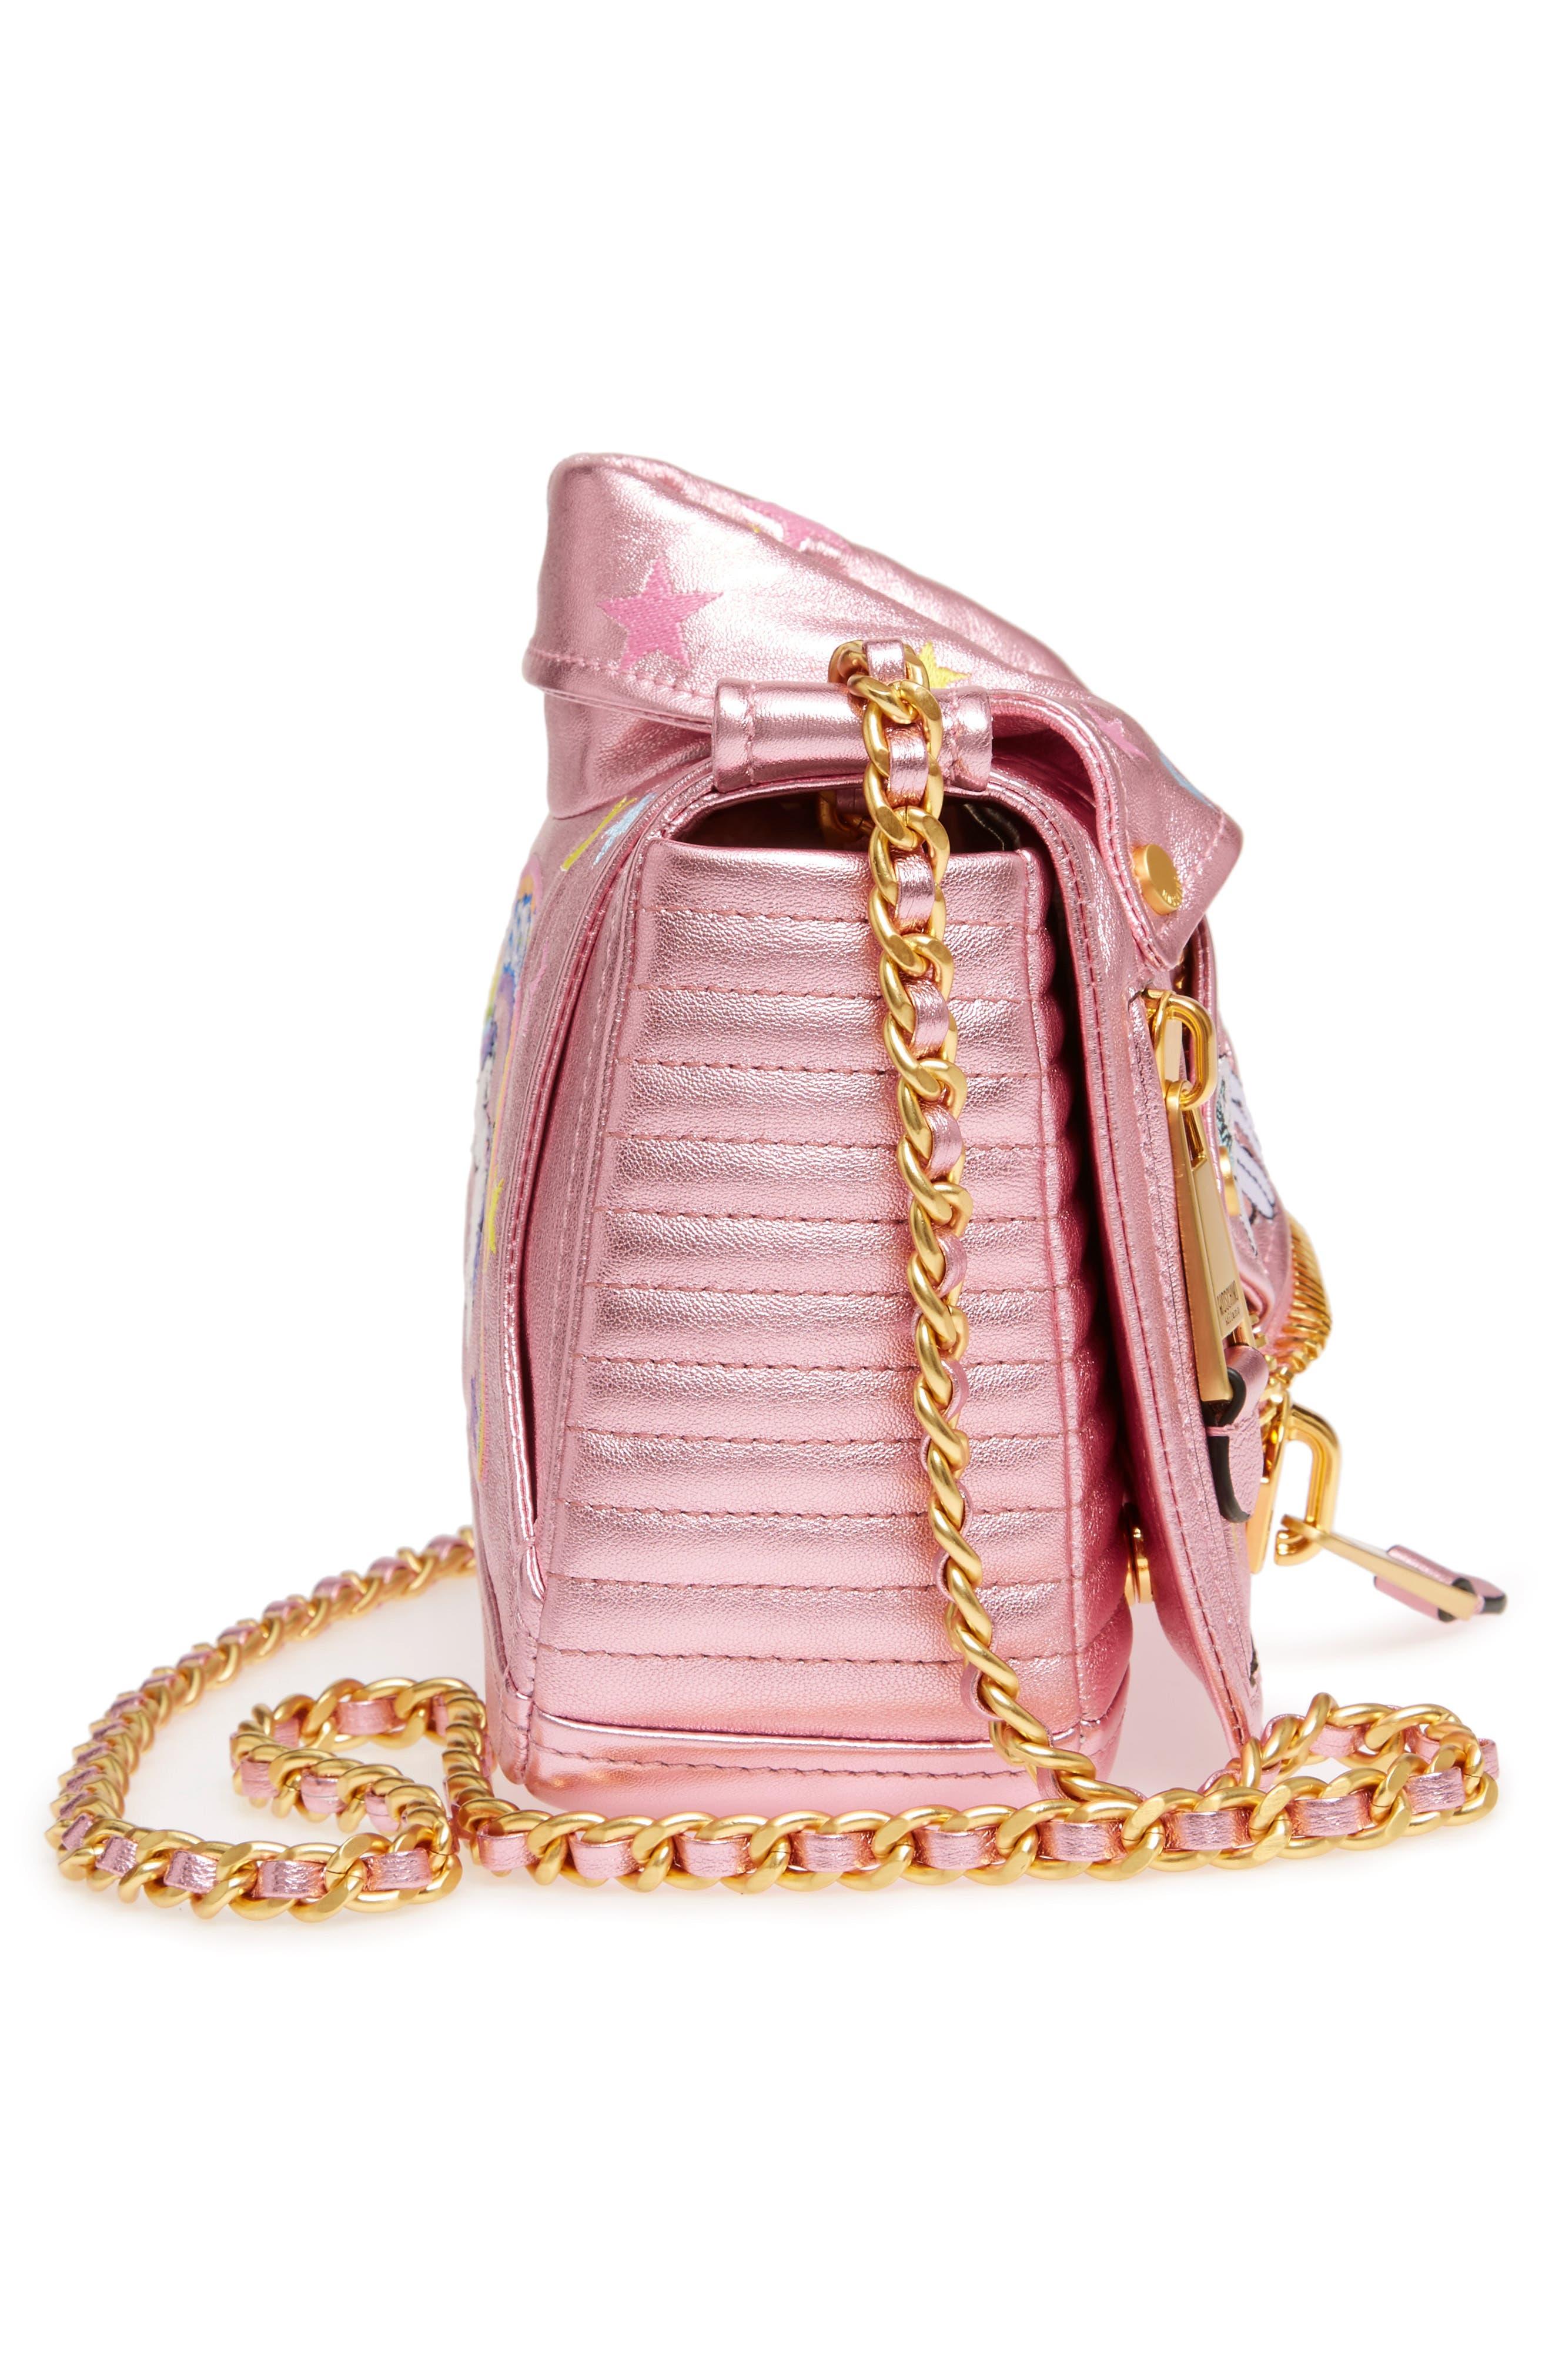 x My Little Pony Biker Jacket Metallic Leather Crossbody Bag,                             Alternate thumbnail 5, color,                             Pink